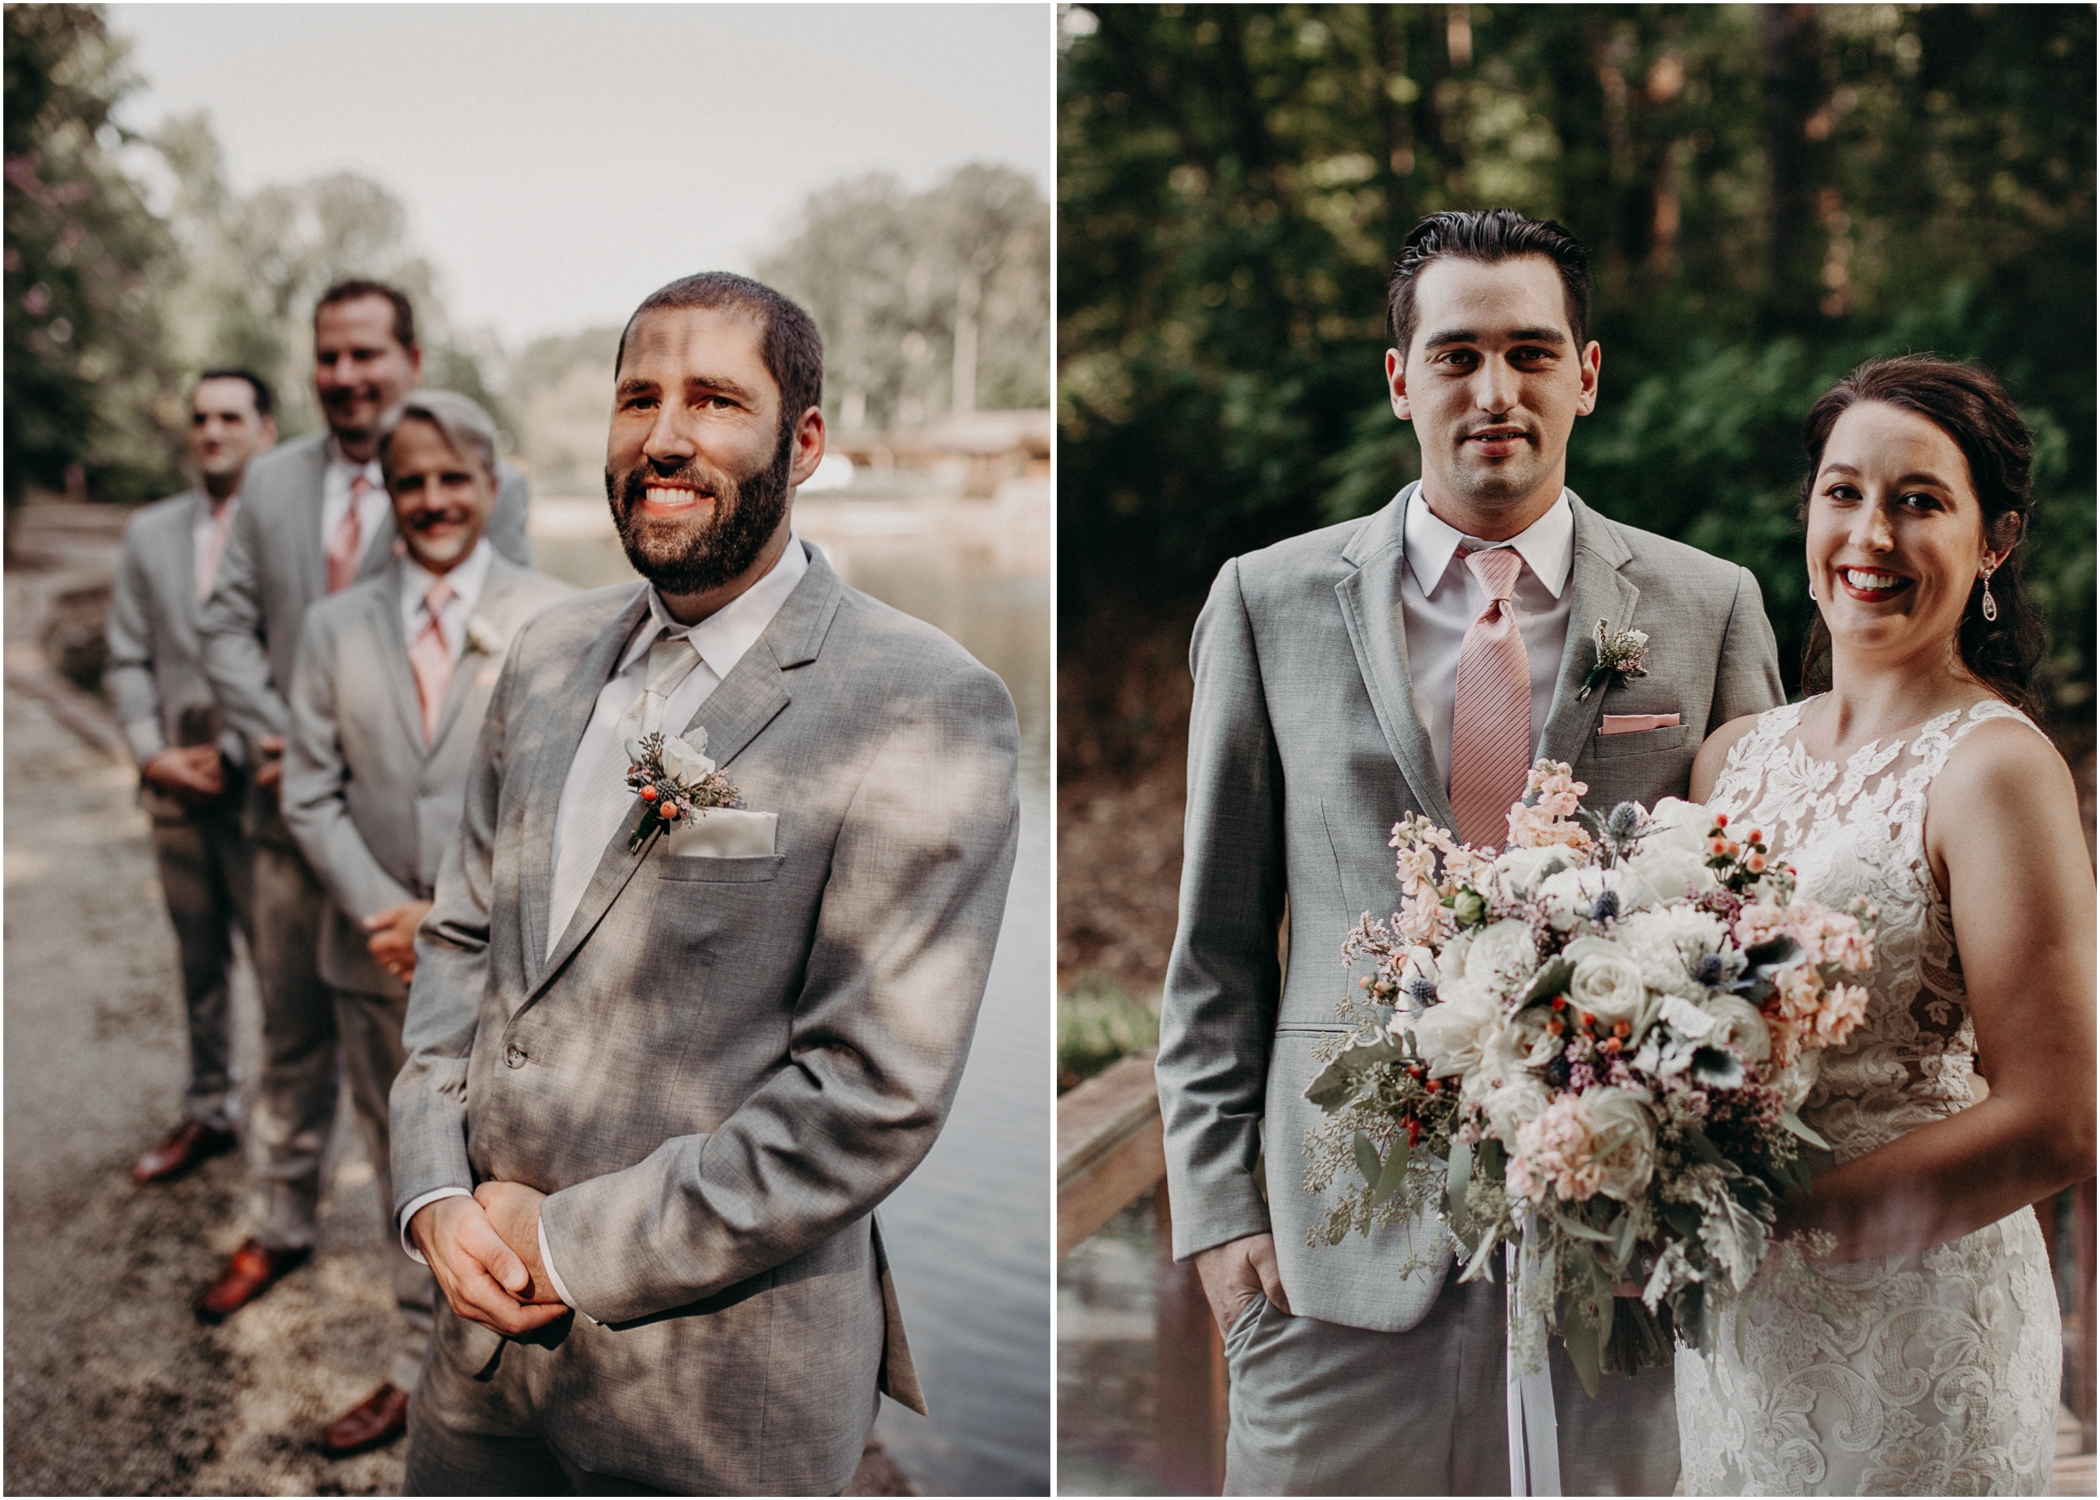 49 wedding day portraits bride and groom atlanta - georgia - ga wedding photographer .jpg